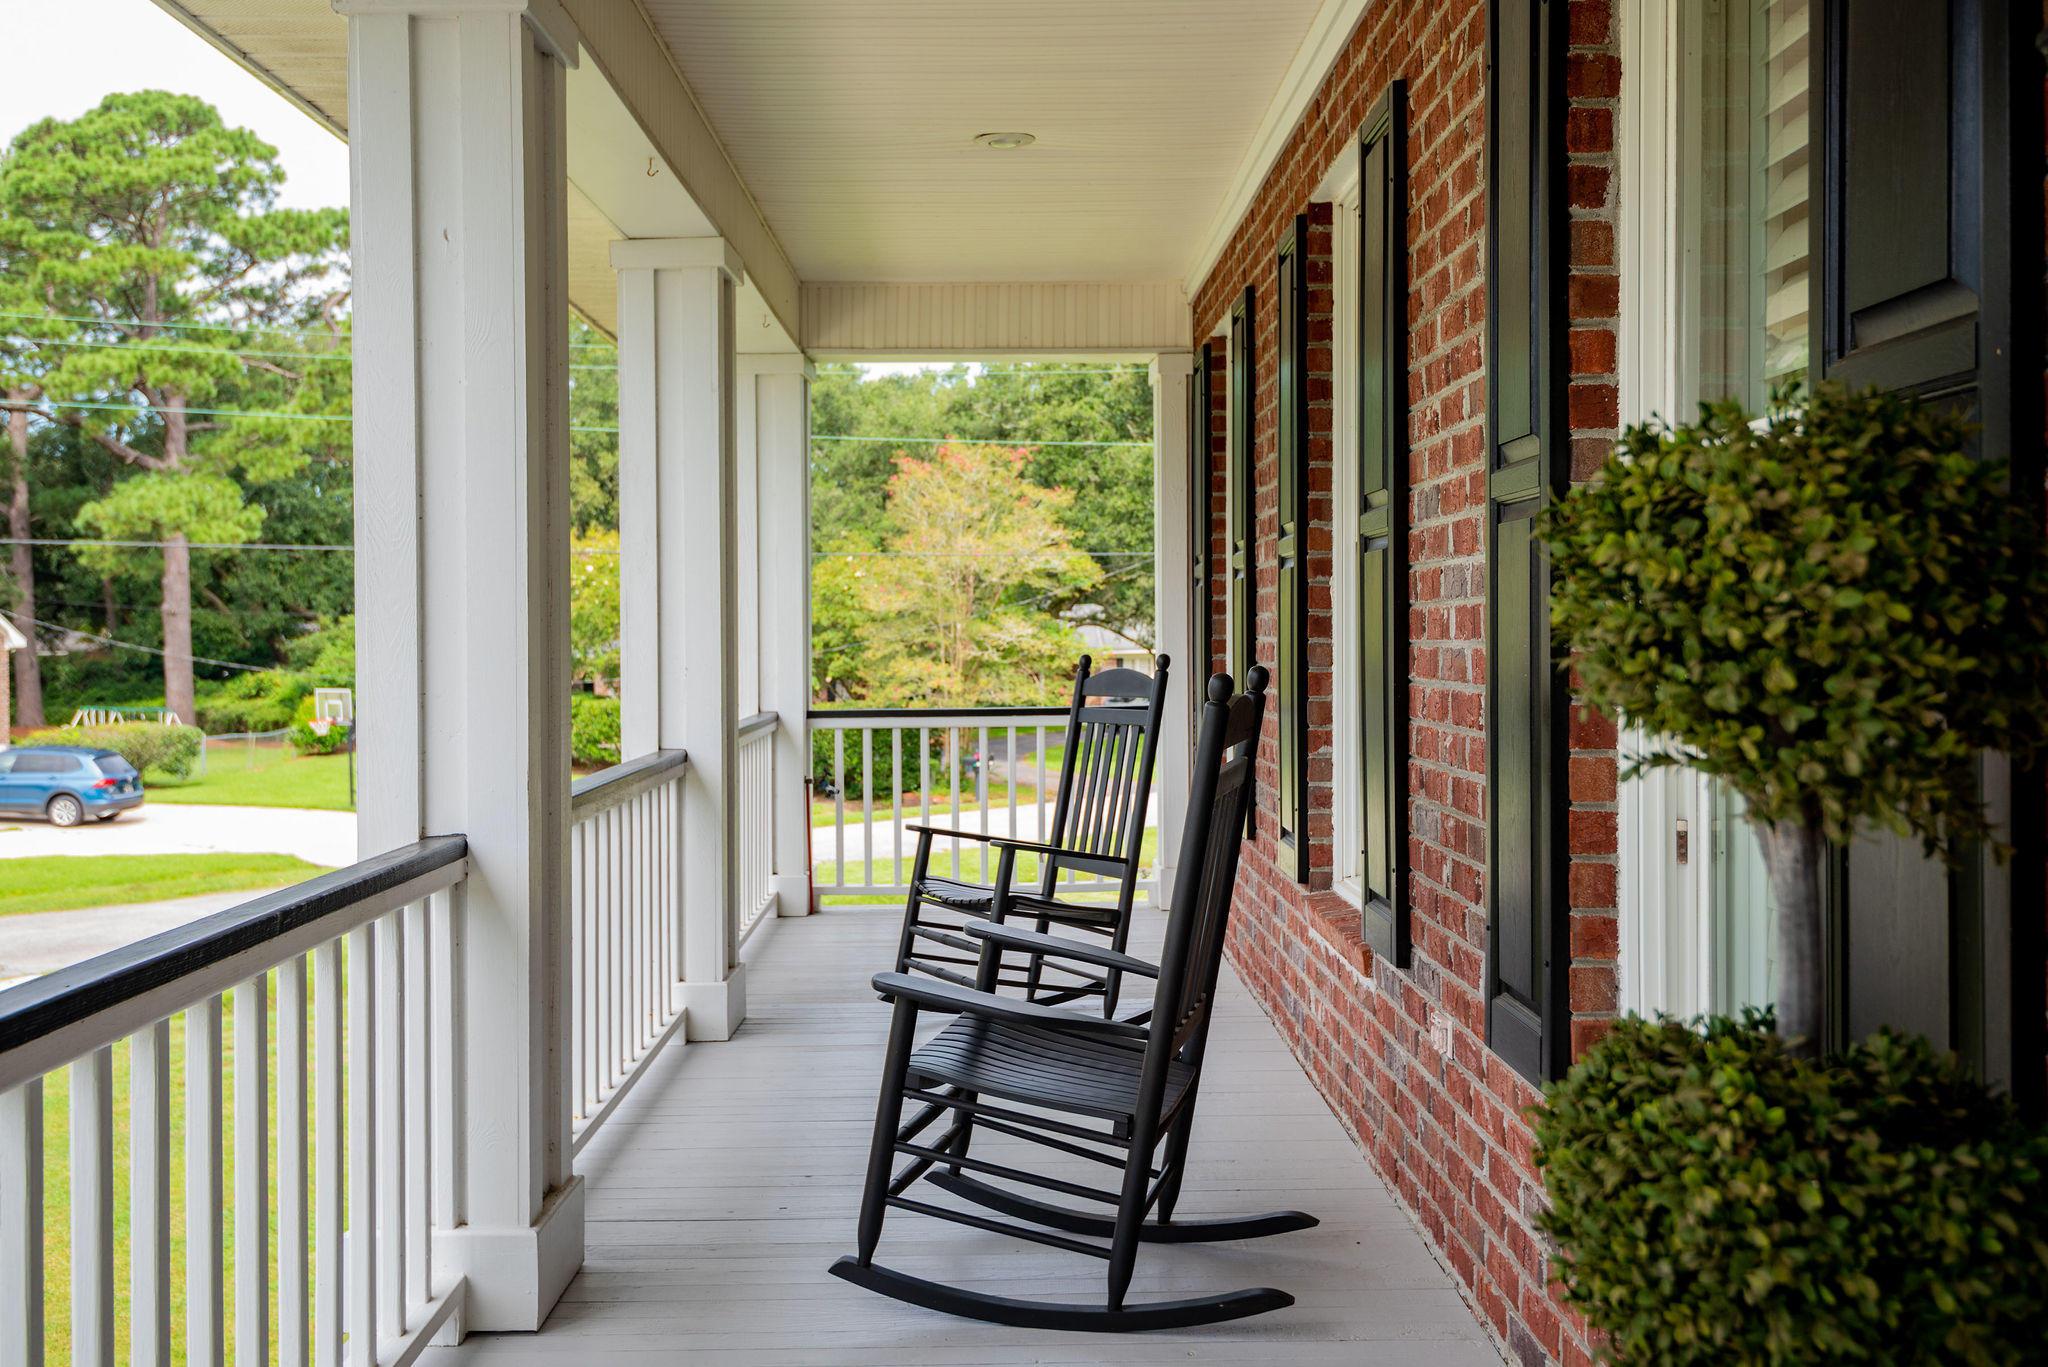 Country Club II Homes For Sale - 1482 Burningtree, Charleston, SC - 60